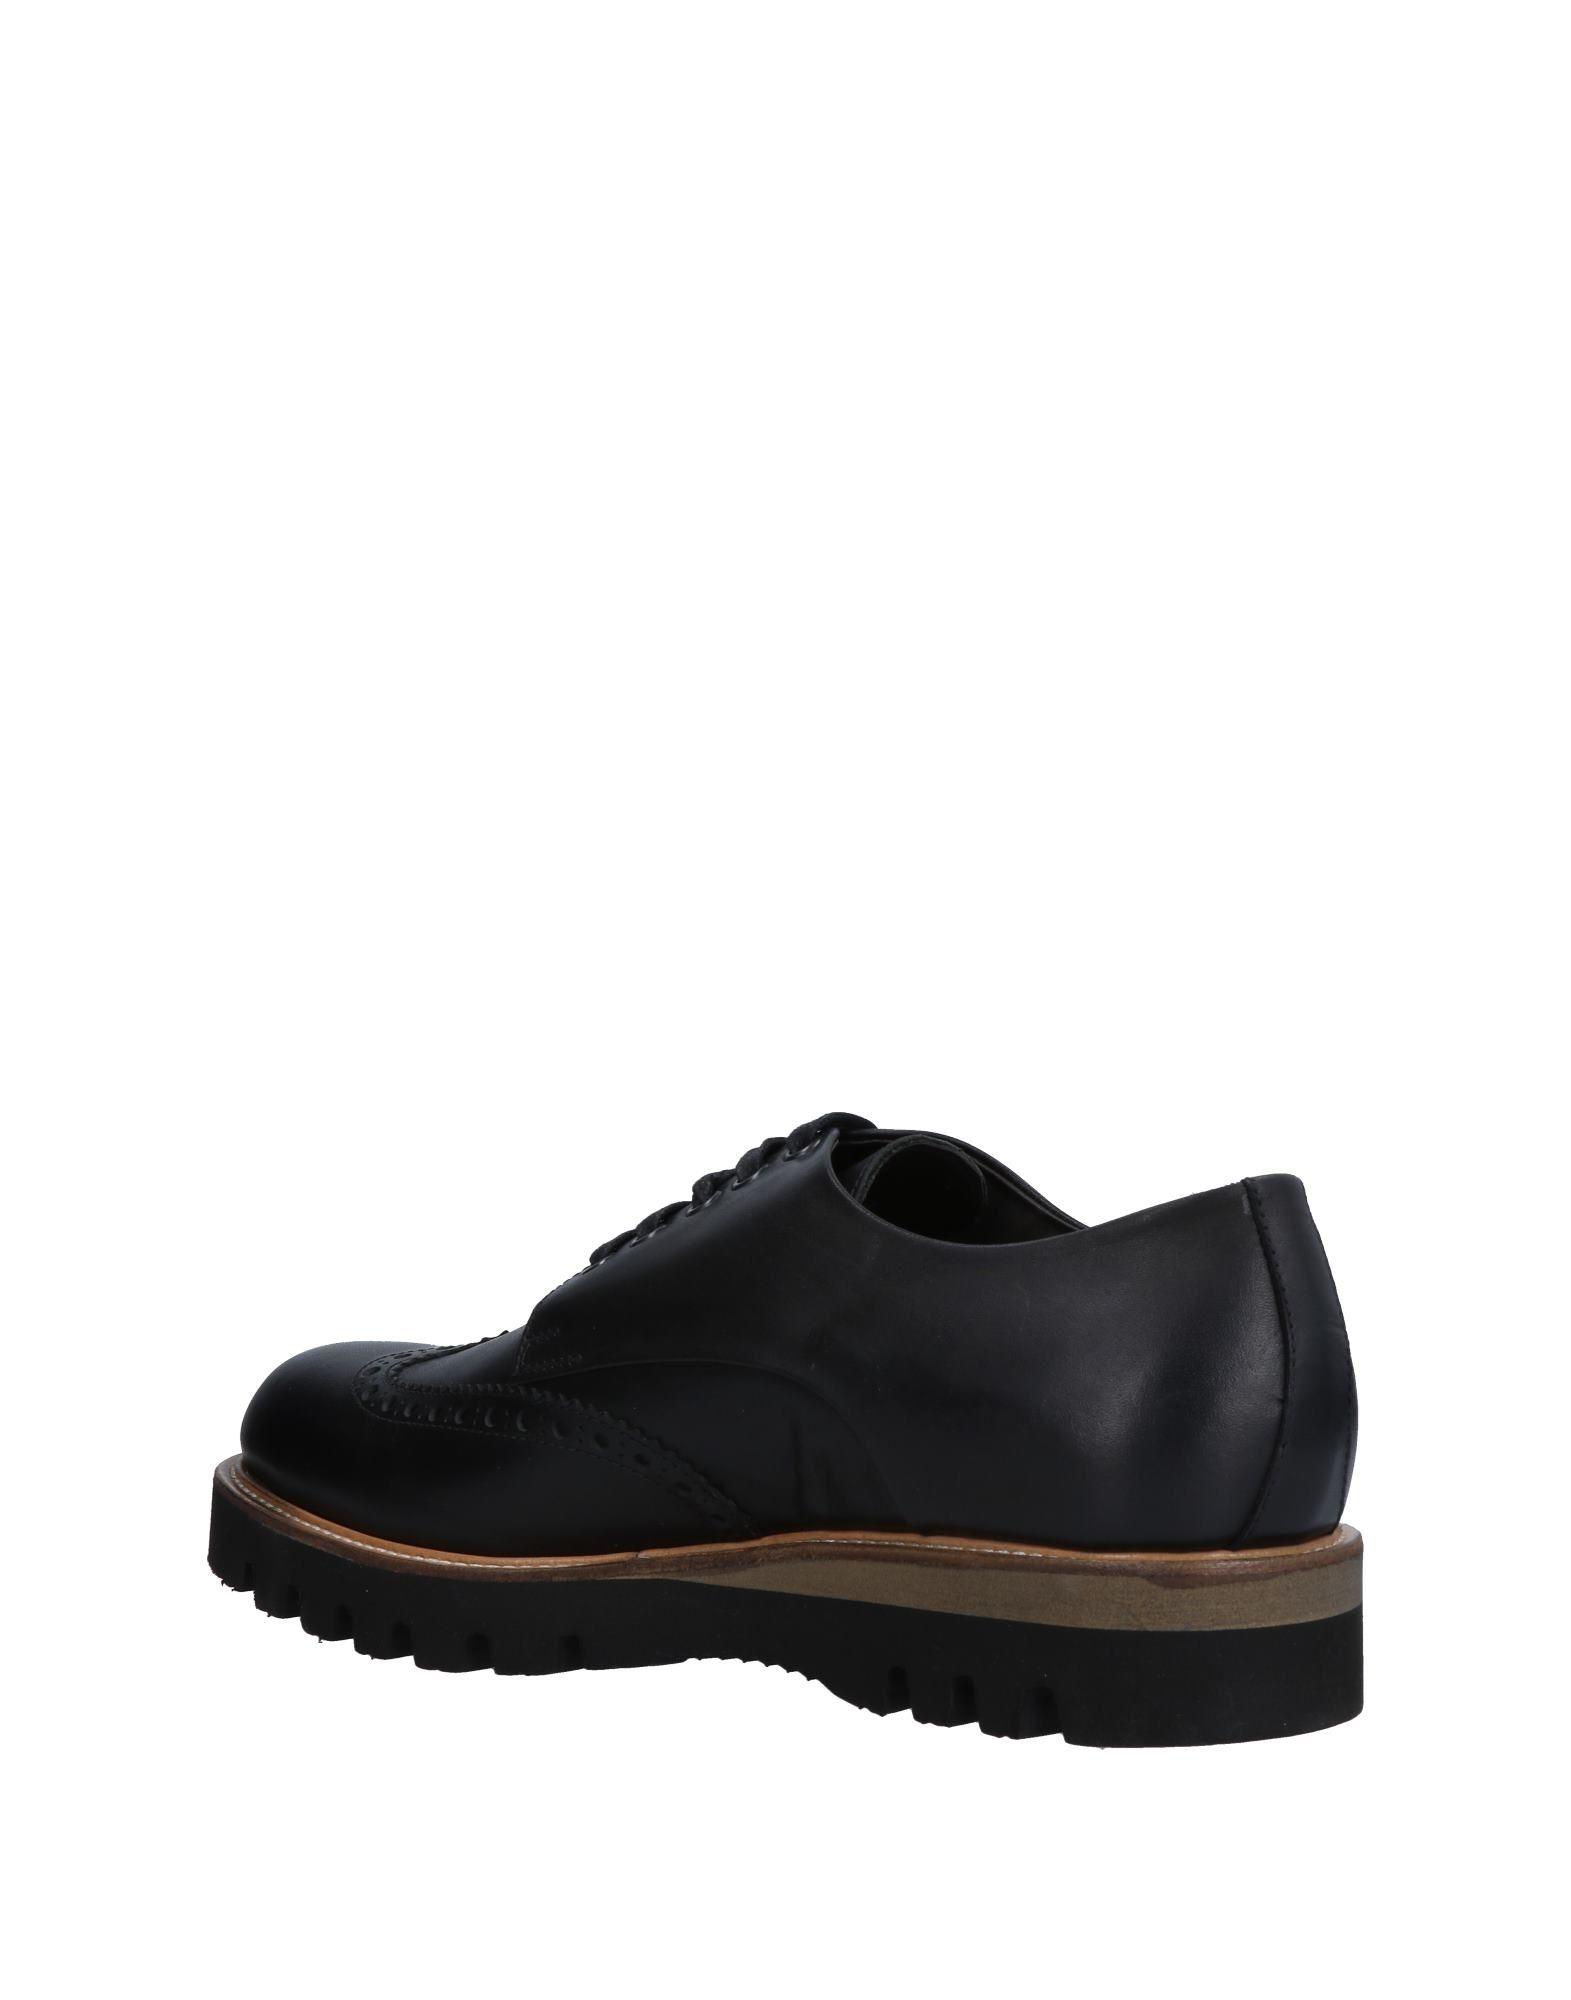 Wexford Schnürschuhe Herren Heiße  11507879TL Heiße Herren Schuhe 50e4a8